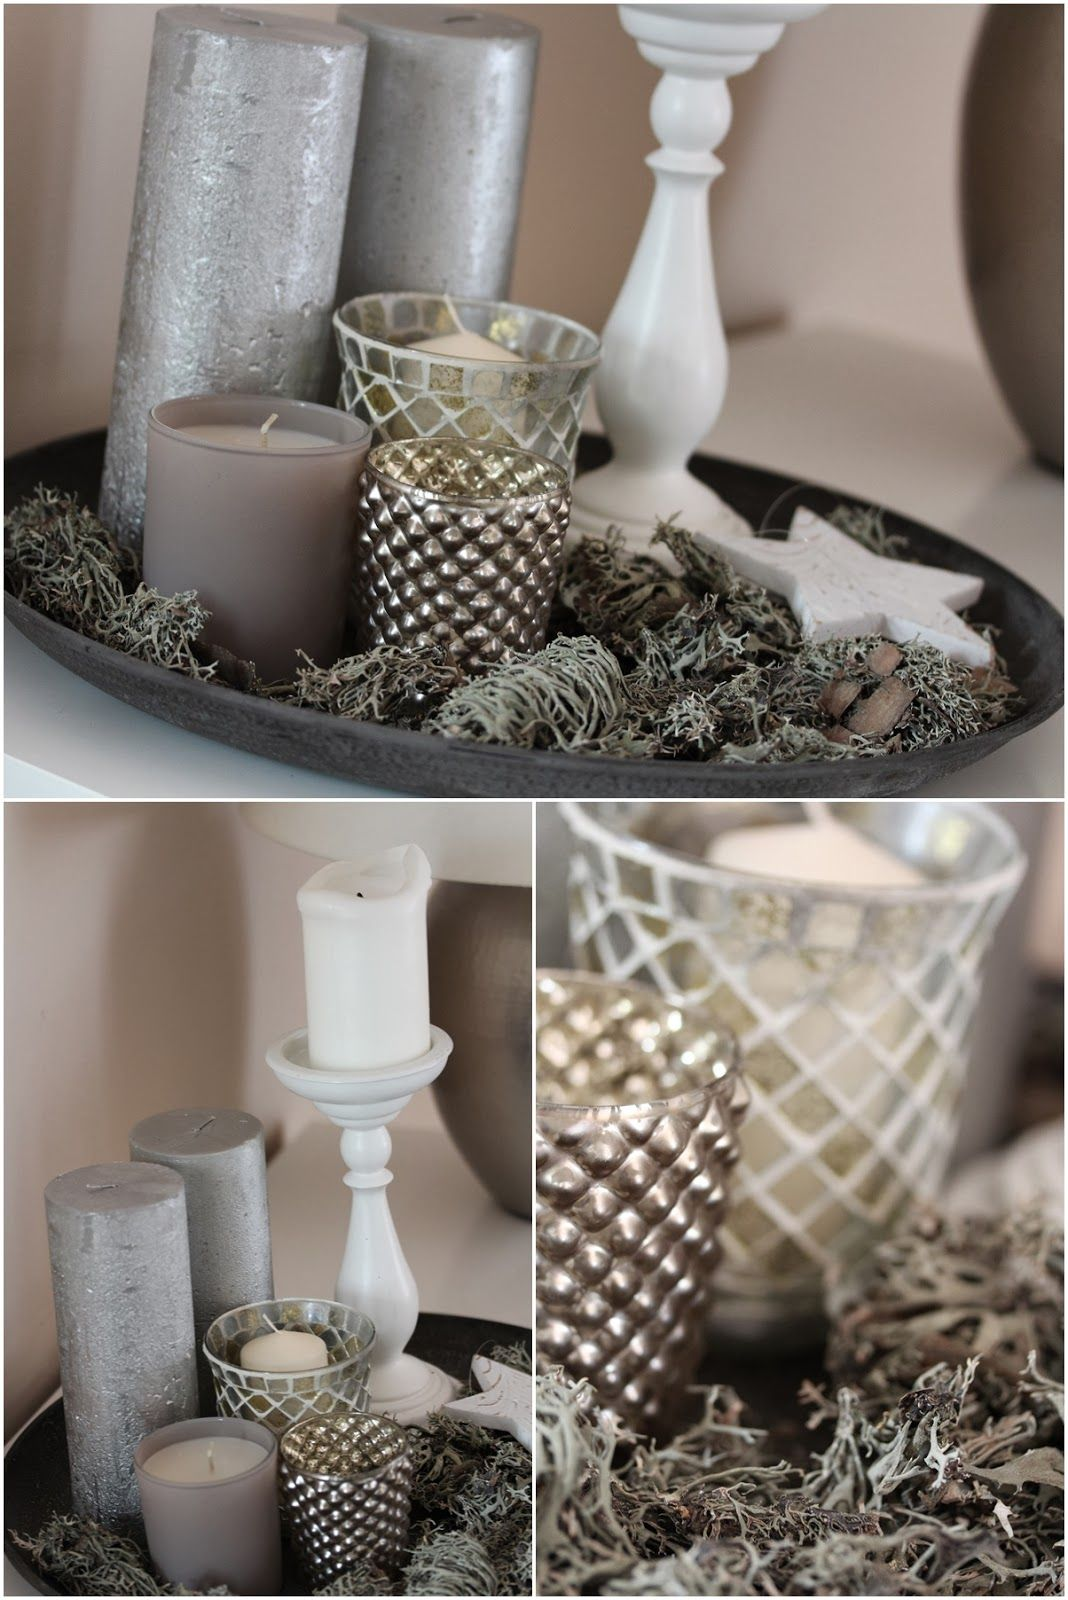 After christmas dekoration kerzen candle white silver for Kerzen dekoration